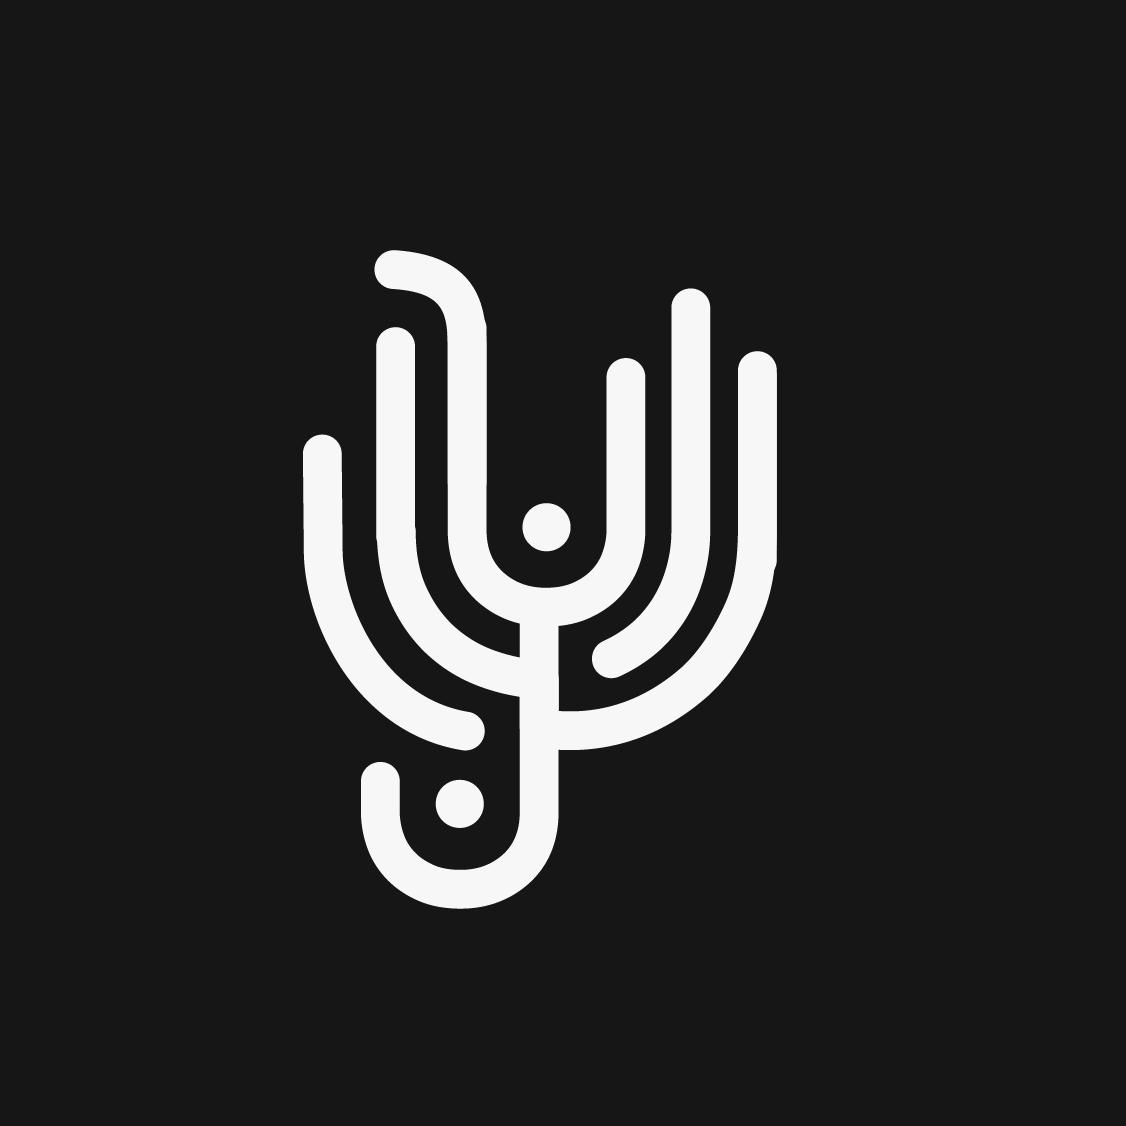 all-logos-2020-43